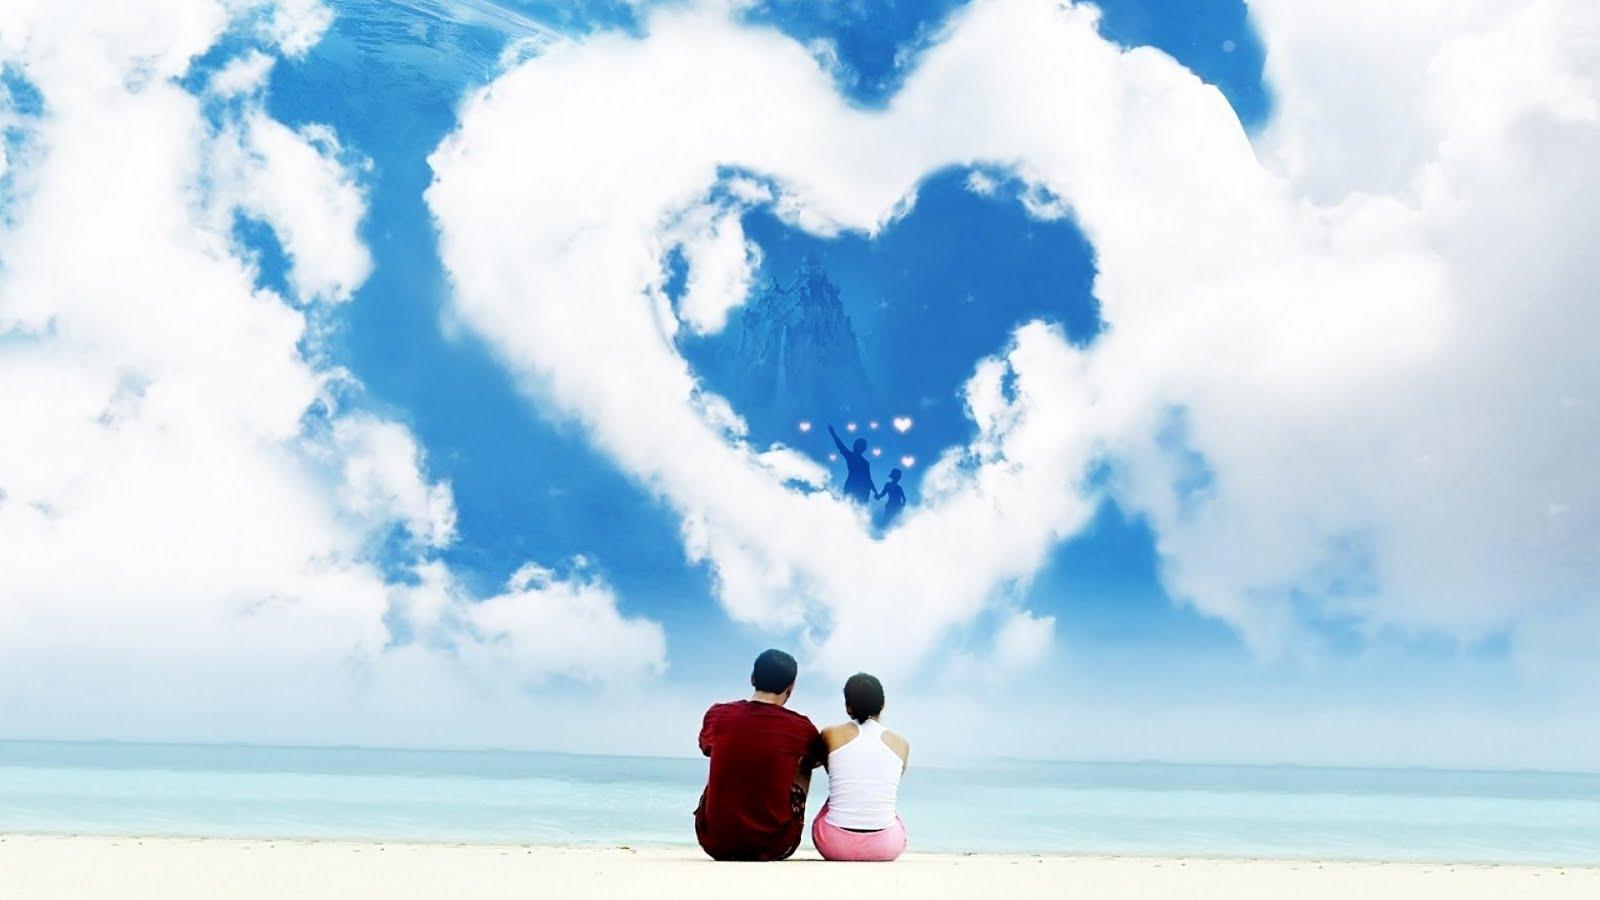 http://3.bp.blogspot.com/-unDxoIFMxTA/TscFQlgvFMI/AAAAAAAAAmg/d5iOfKSJYQc/s1600/valentines-day-wallpaper-3-757800.jpg